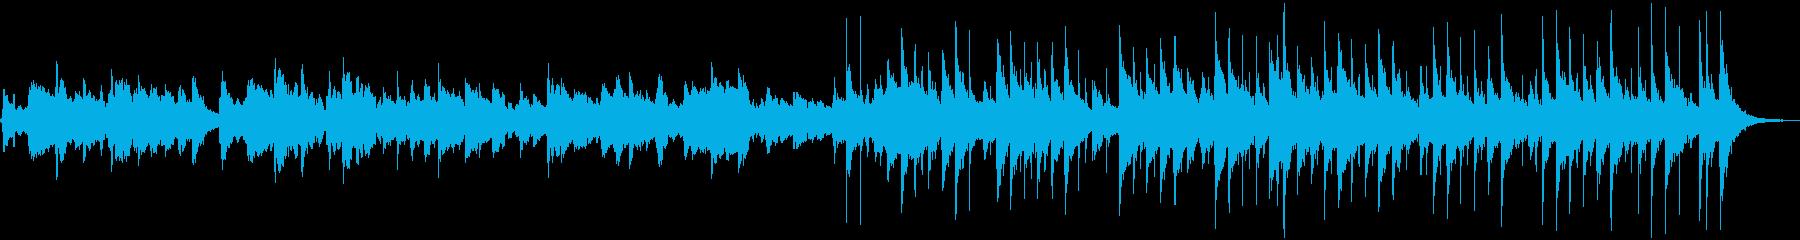 Autumn festival's reproduced waveform